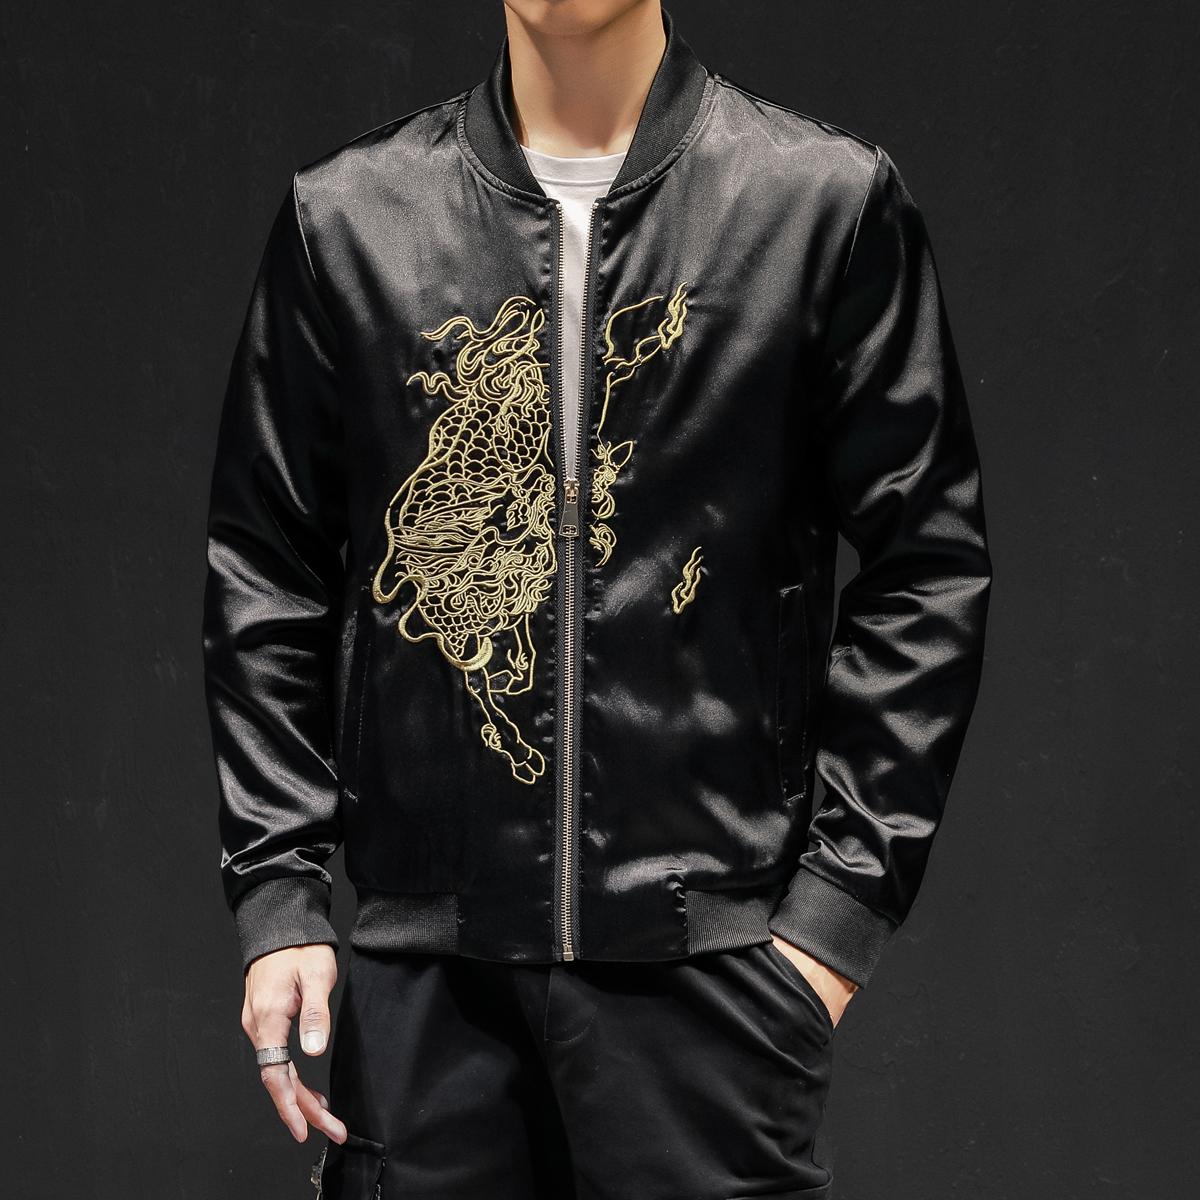 7034-P135秋季中国风复古麒麟刺绣夹克外套男士衣服QT715